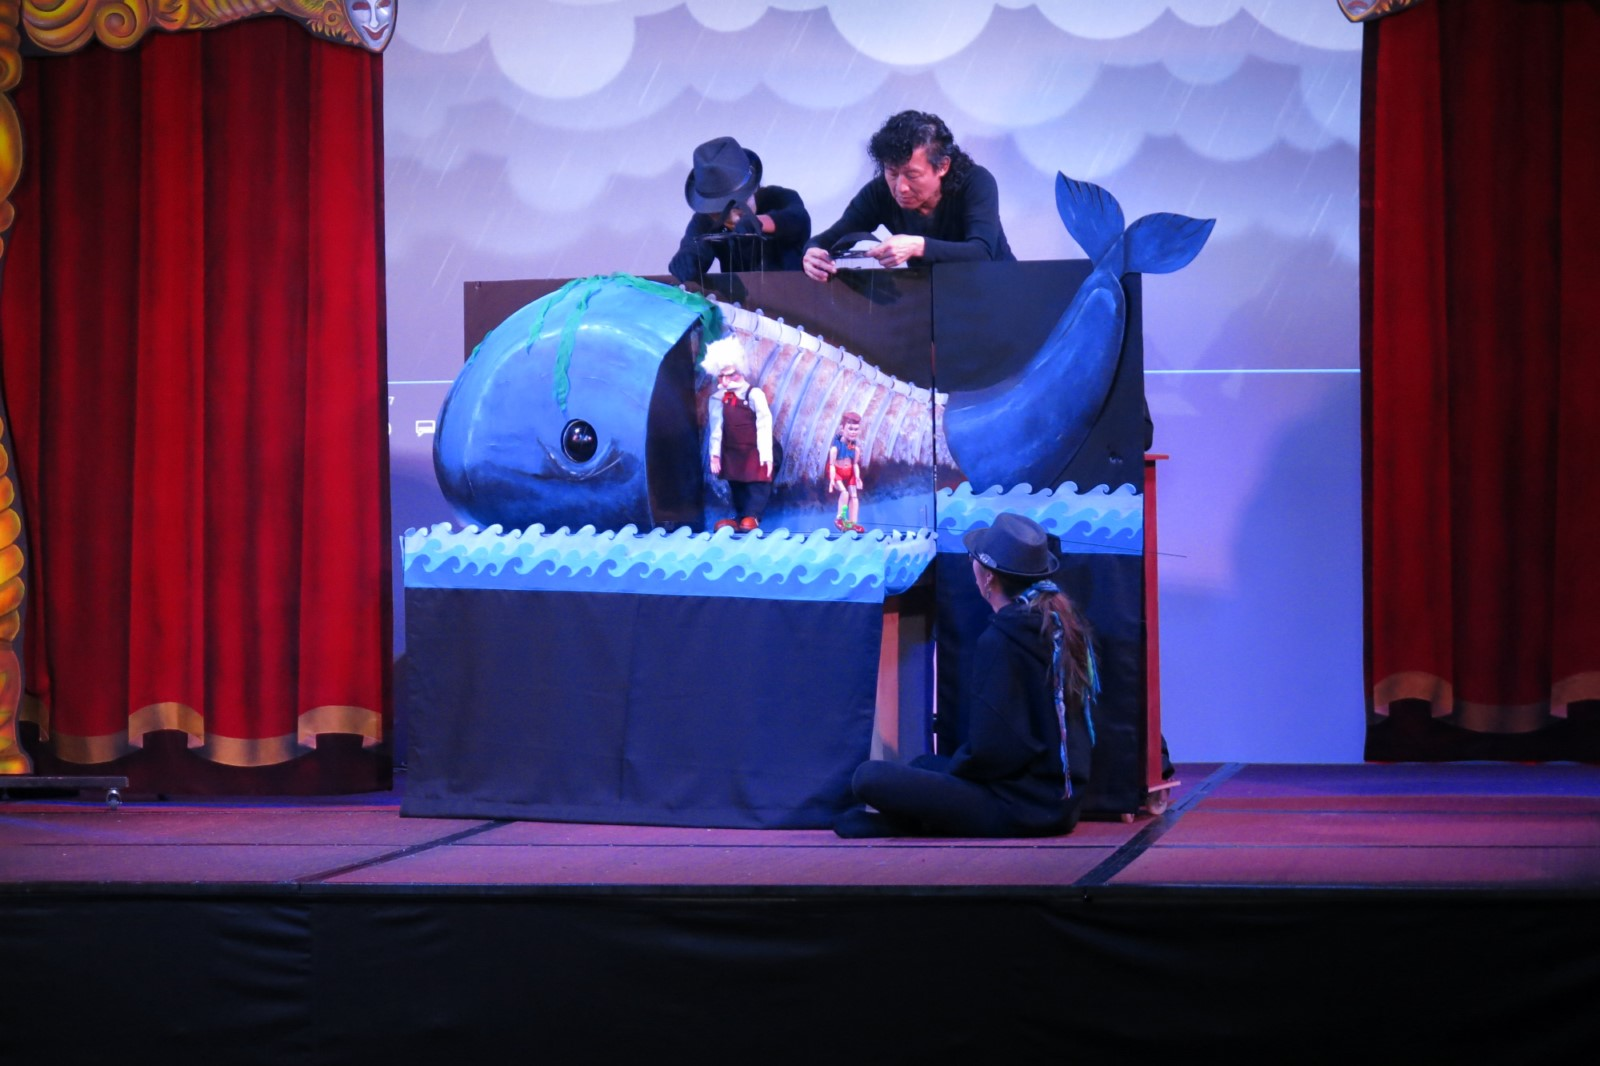 Pinocchio puppet show